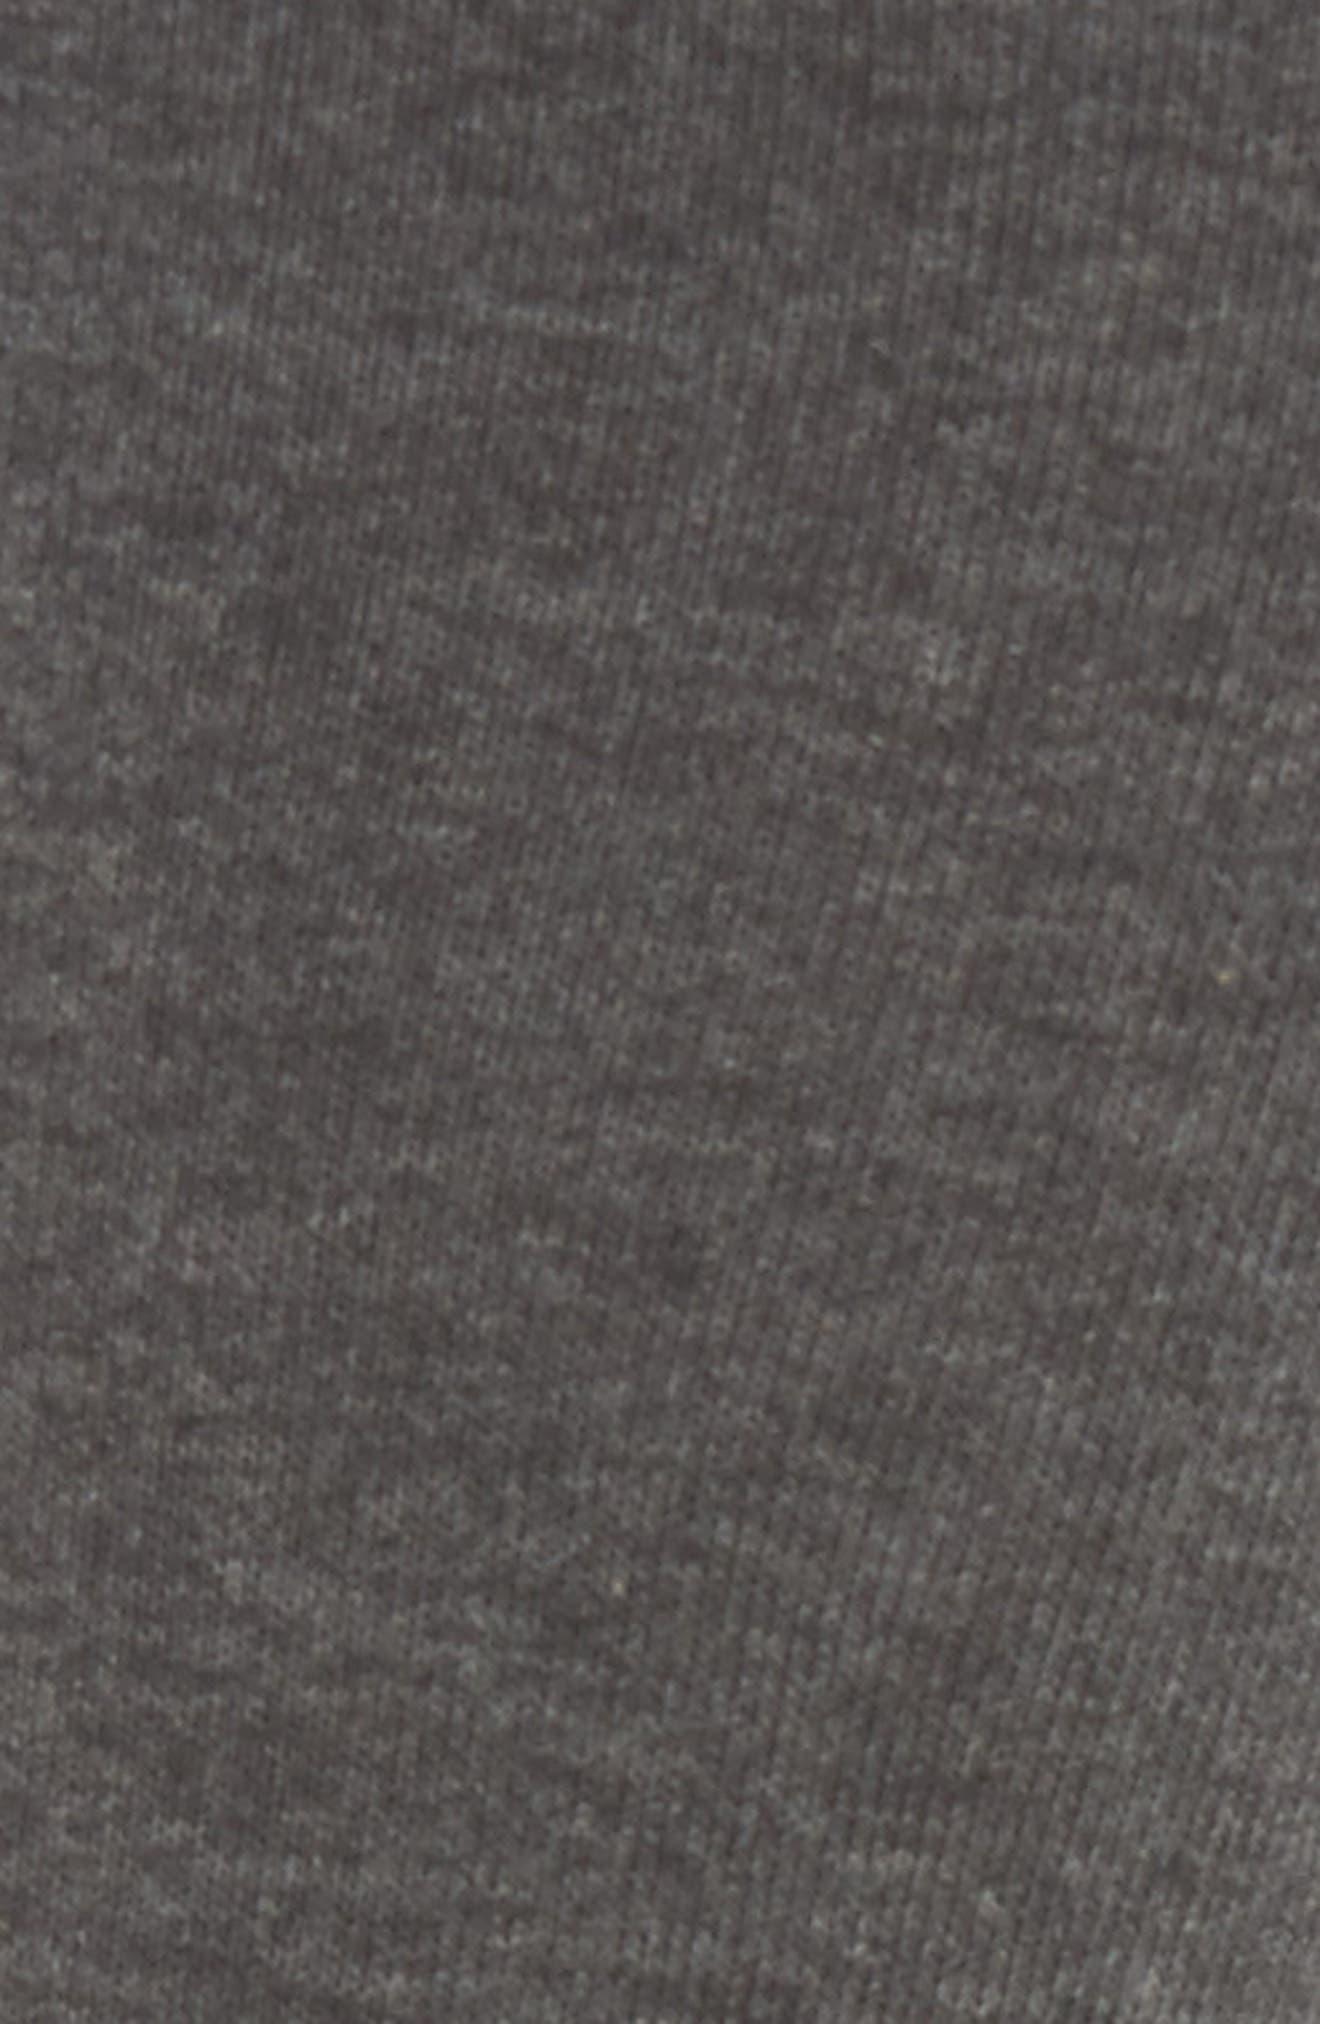 Keep Vibing Crew Socks,                             Alternate thumbnail 3, color,